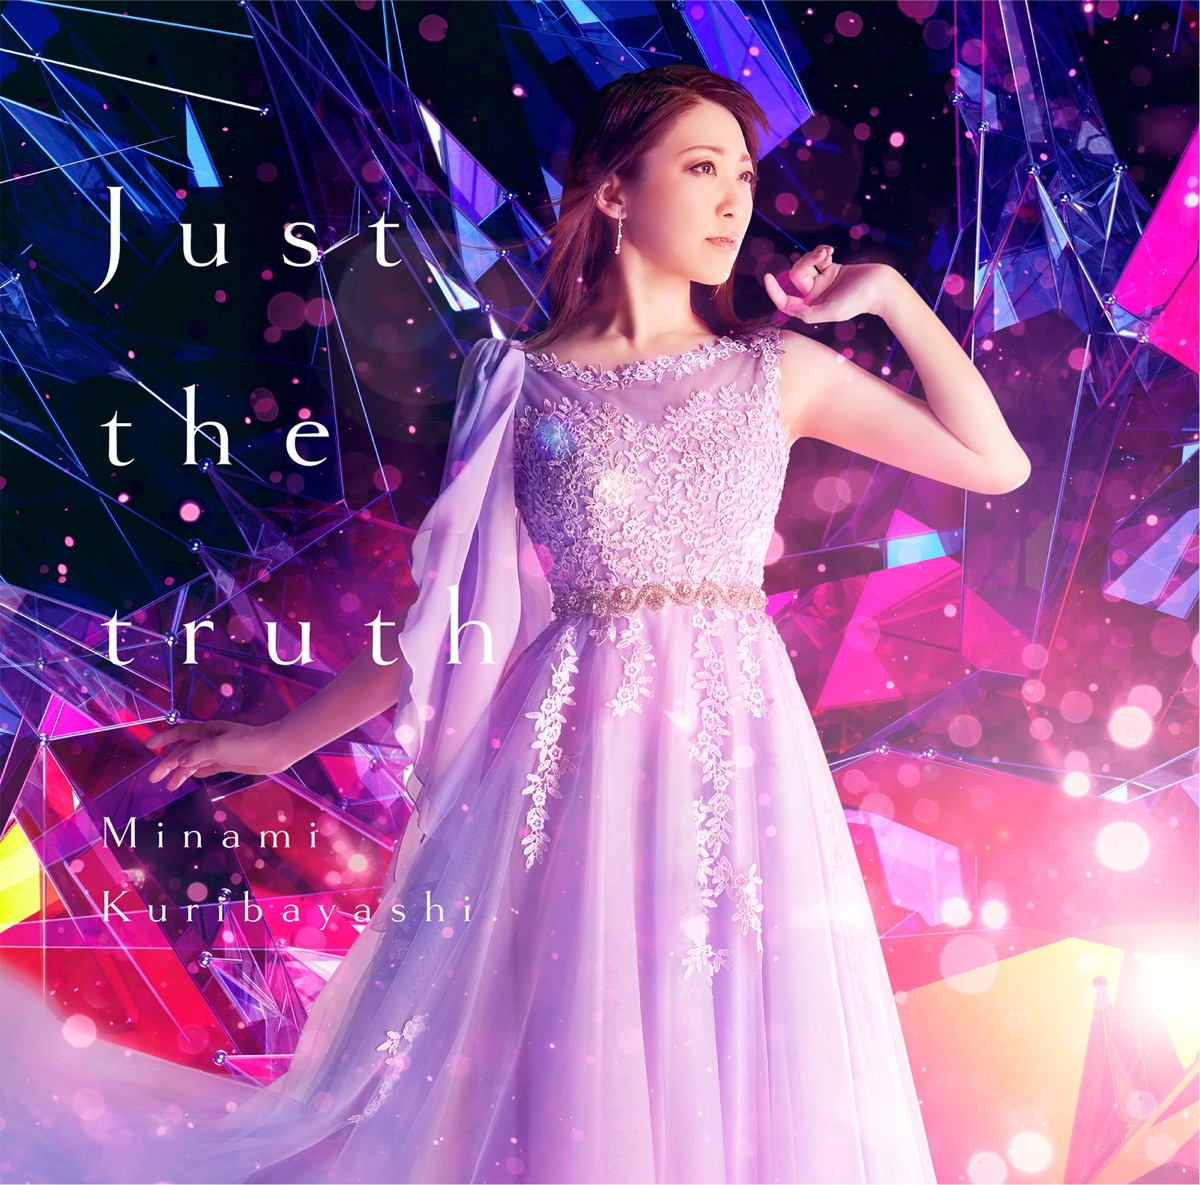 Minami-Kuribayashi-Just-the-truth